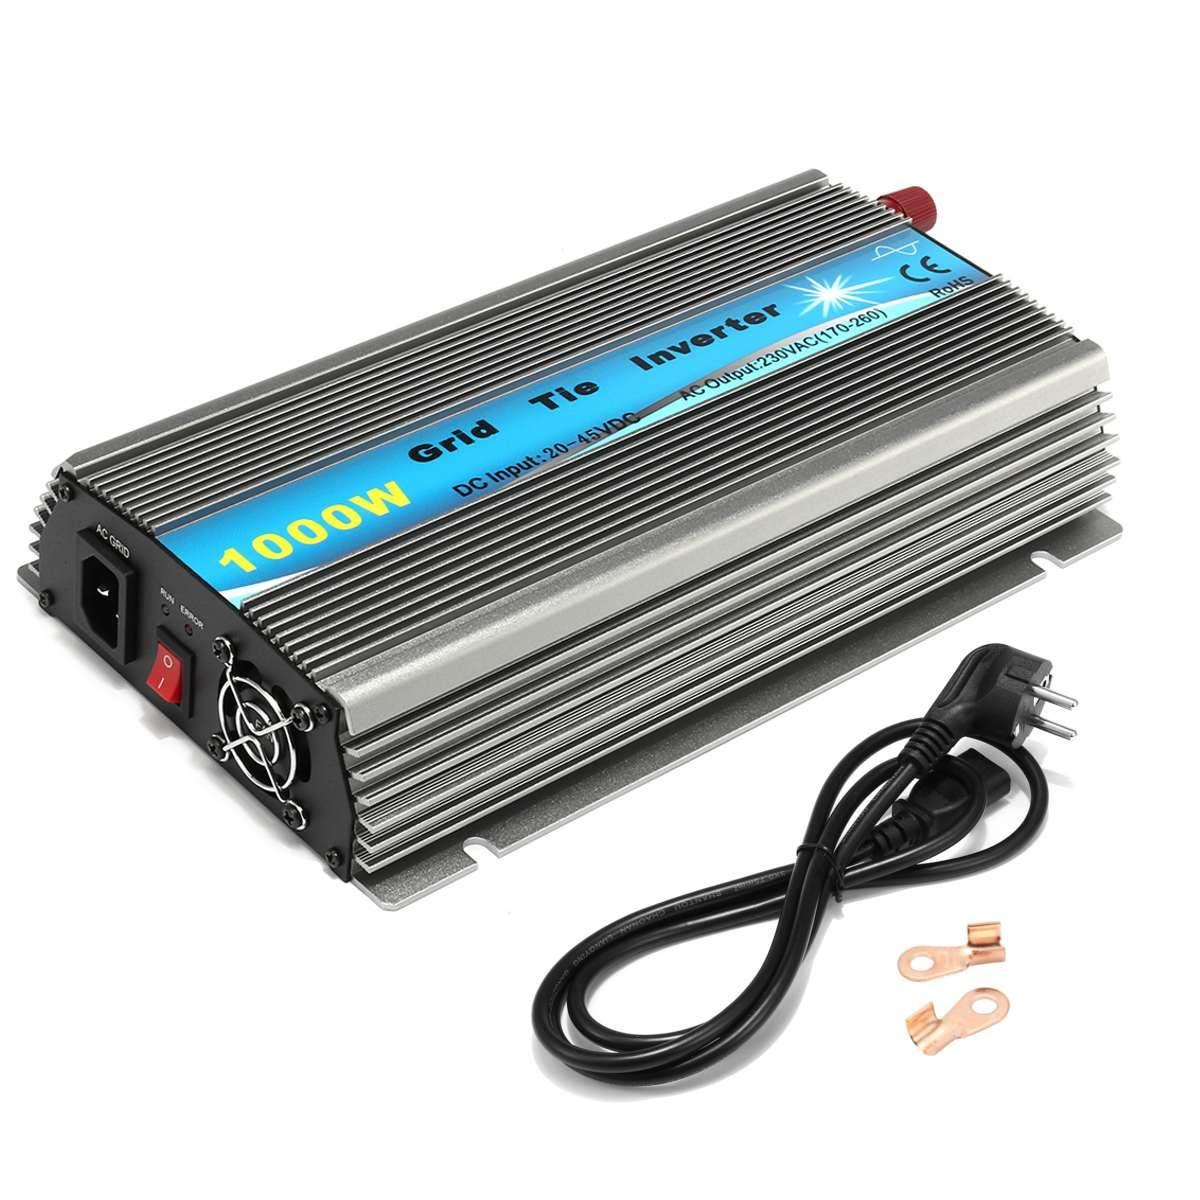 WonVon 1000W Grid Tie Inverter,110V Power Inverter DC 22-50V MPPT Pure Sine Wave Inverter for Solar Panel System by WonVon